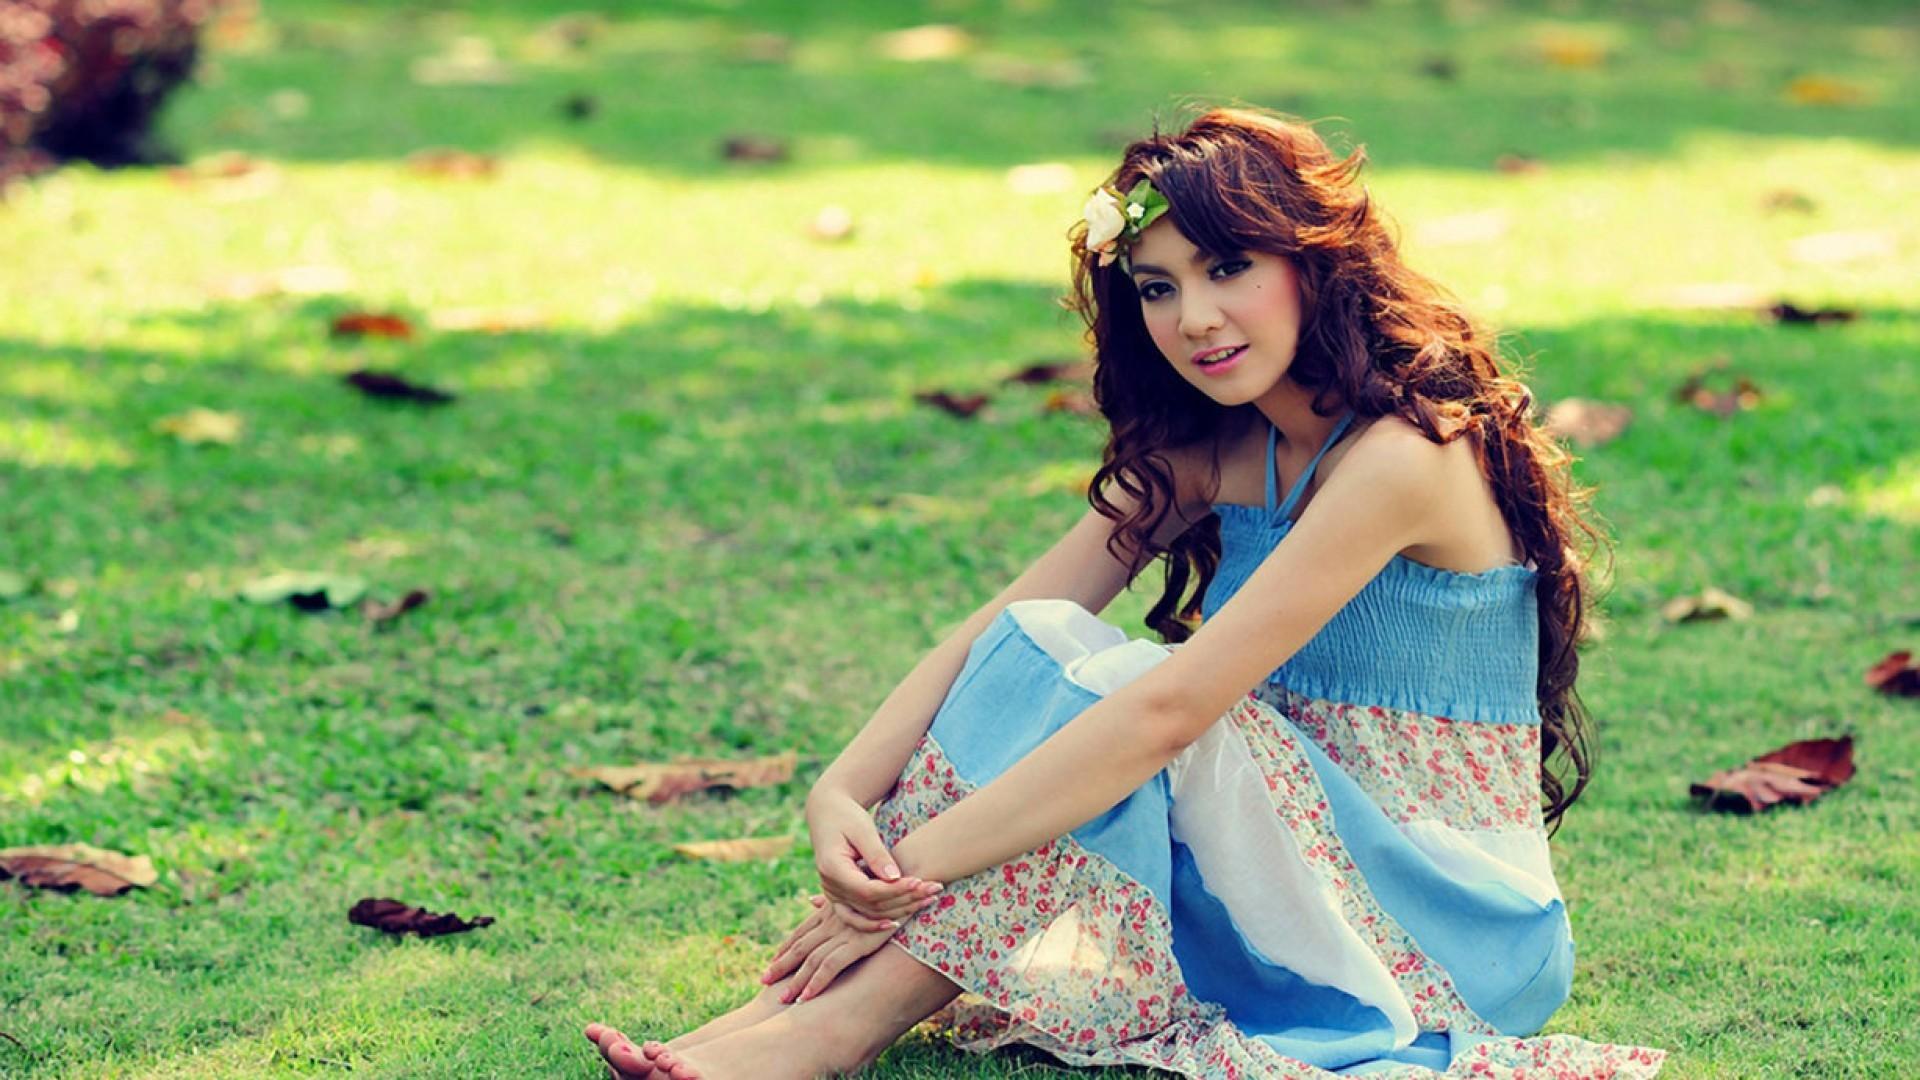 Sweet Sad Girl Hd Wallpaper Hd Wallpapers 1080p Girls 72 Images